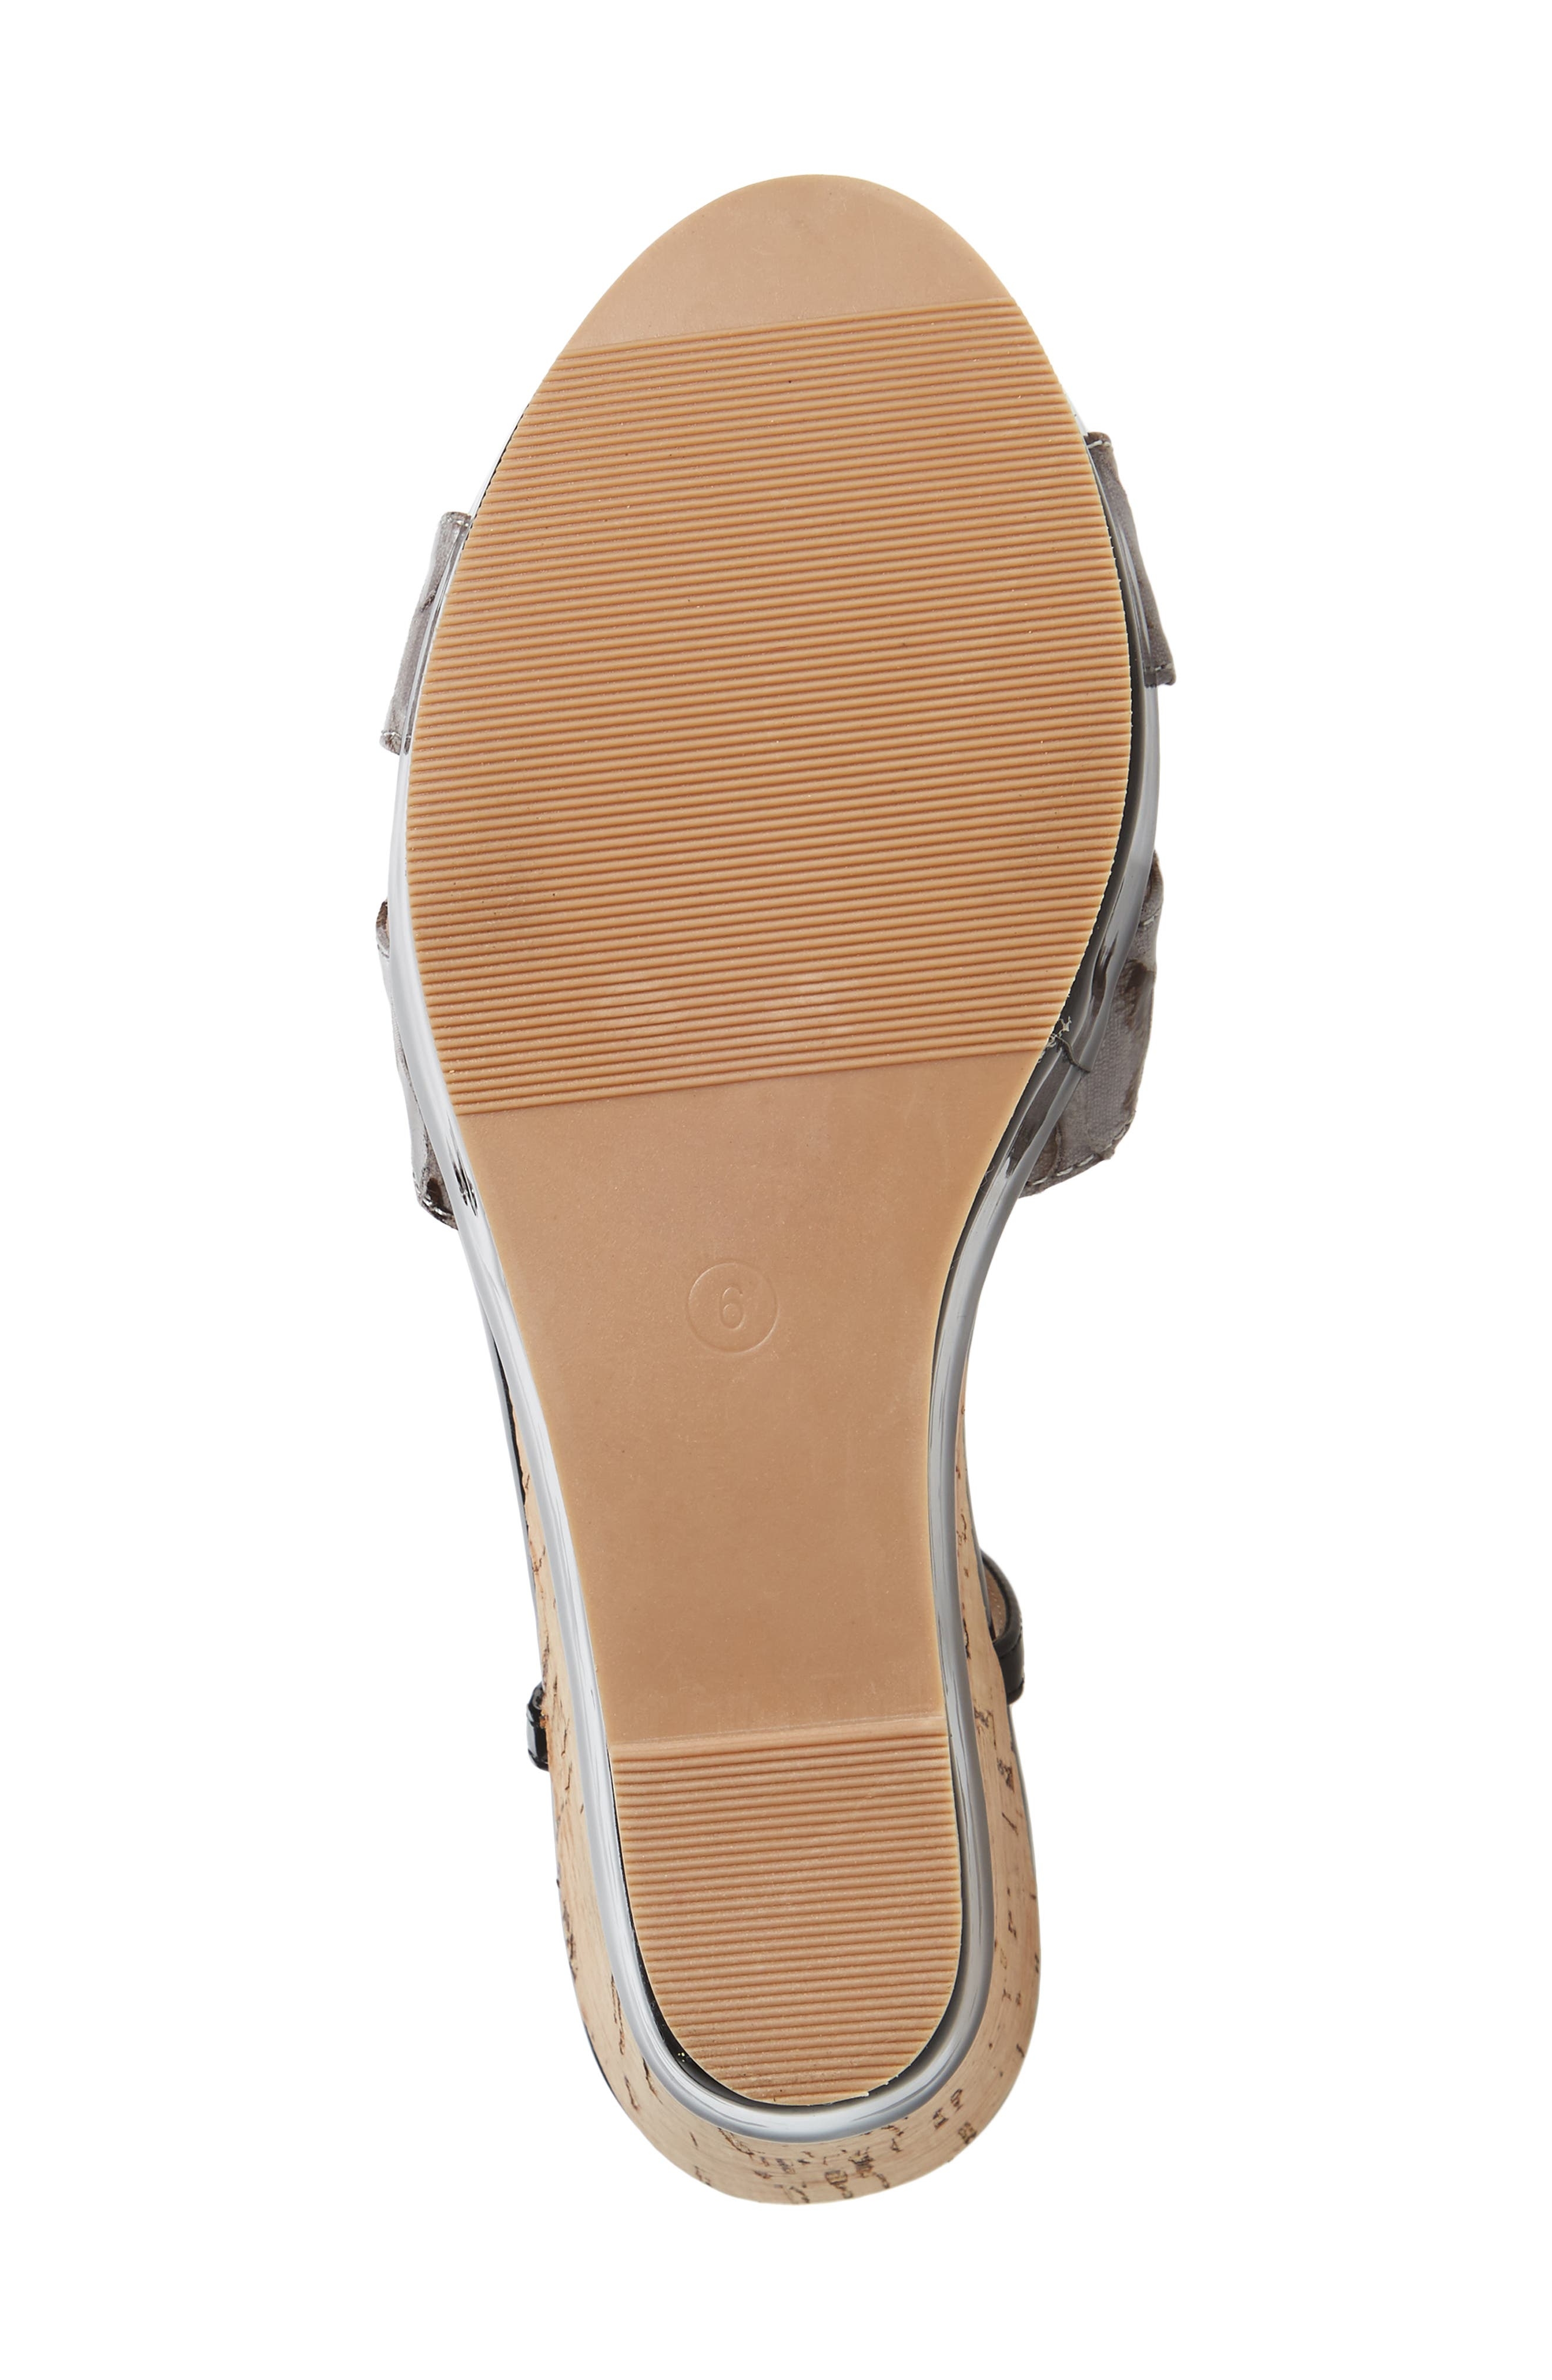 Lottie Platform Wedge Sandal,                             Alternate thumbnail 6, color,                             BLACK SYNTHETIC